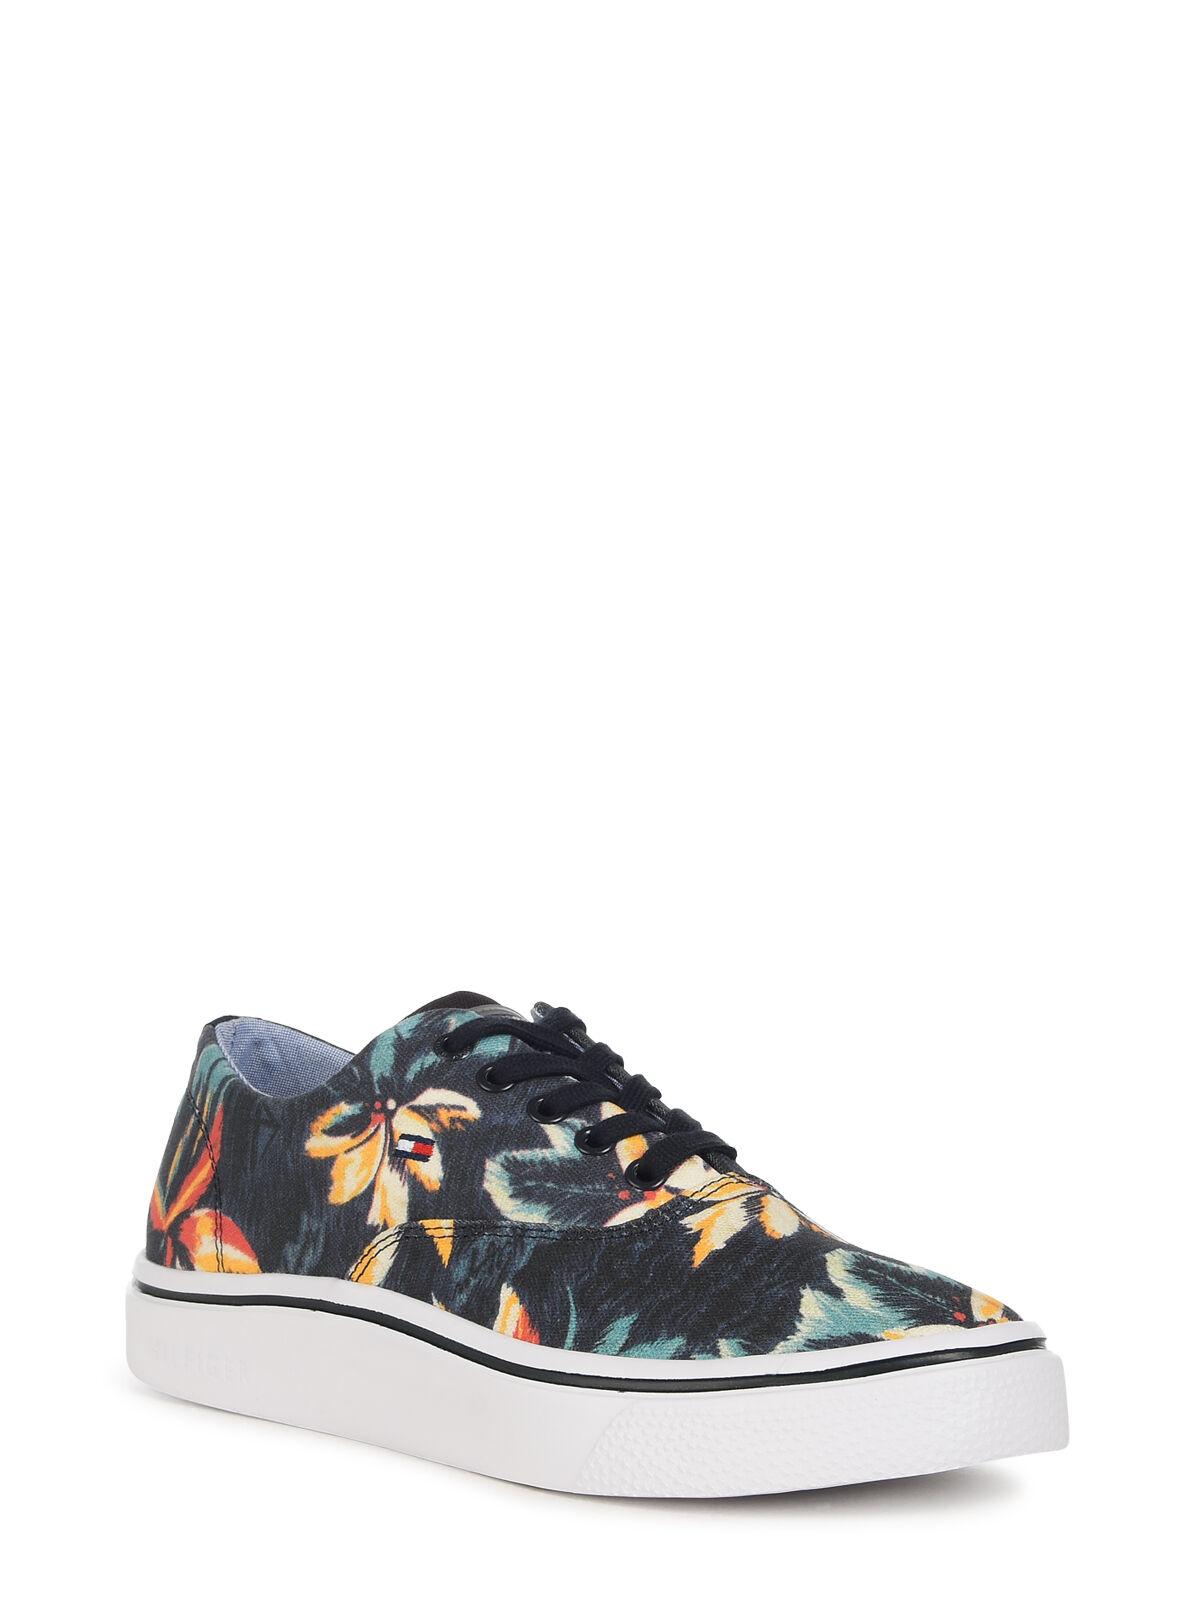 Tommy Hilfiger Oxford Sneaker navy